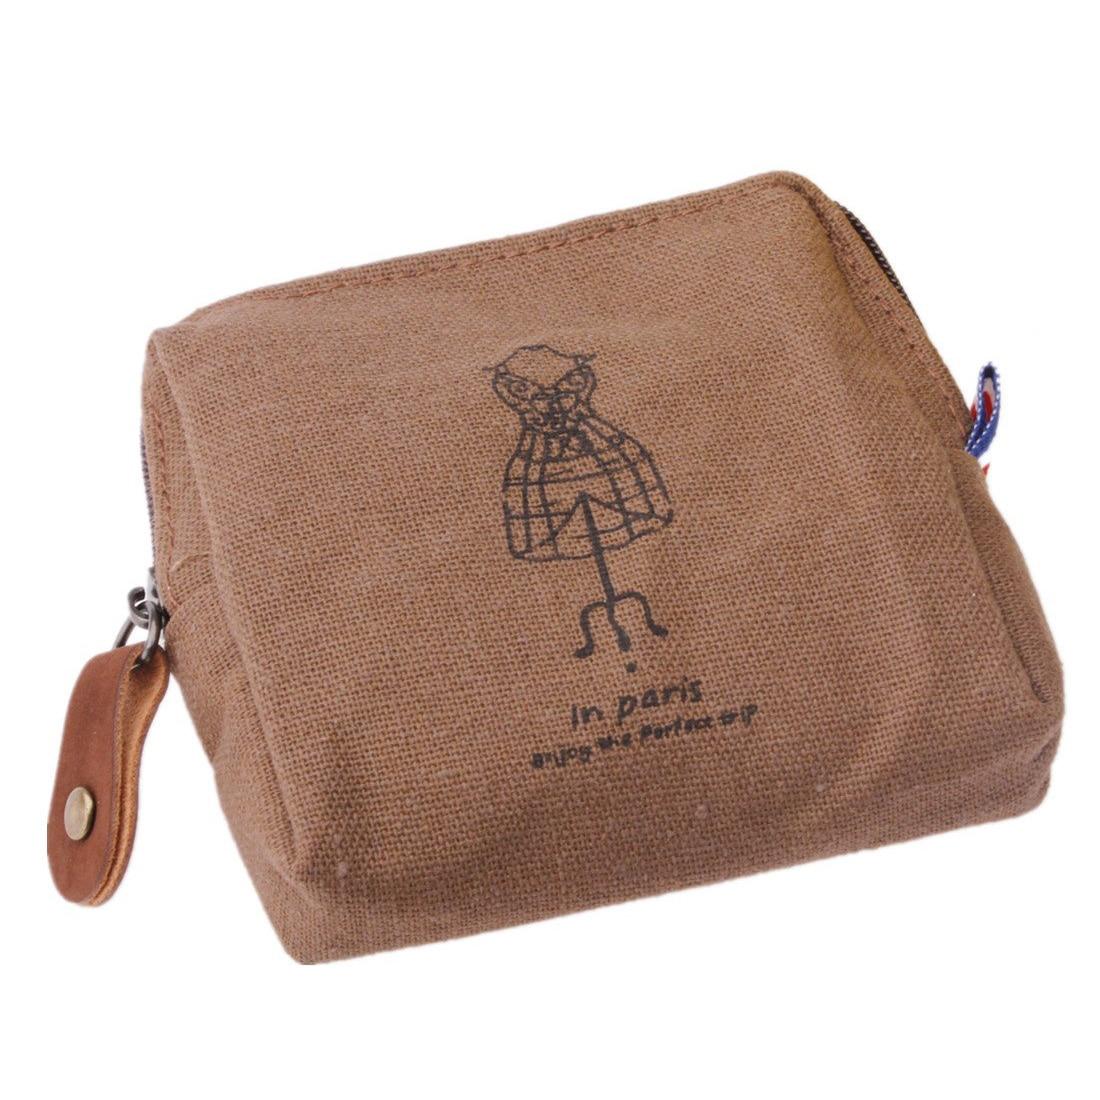 Woman girl Retro portable purse bag pouch for key card Wallet Brown